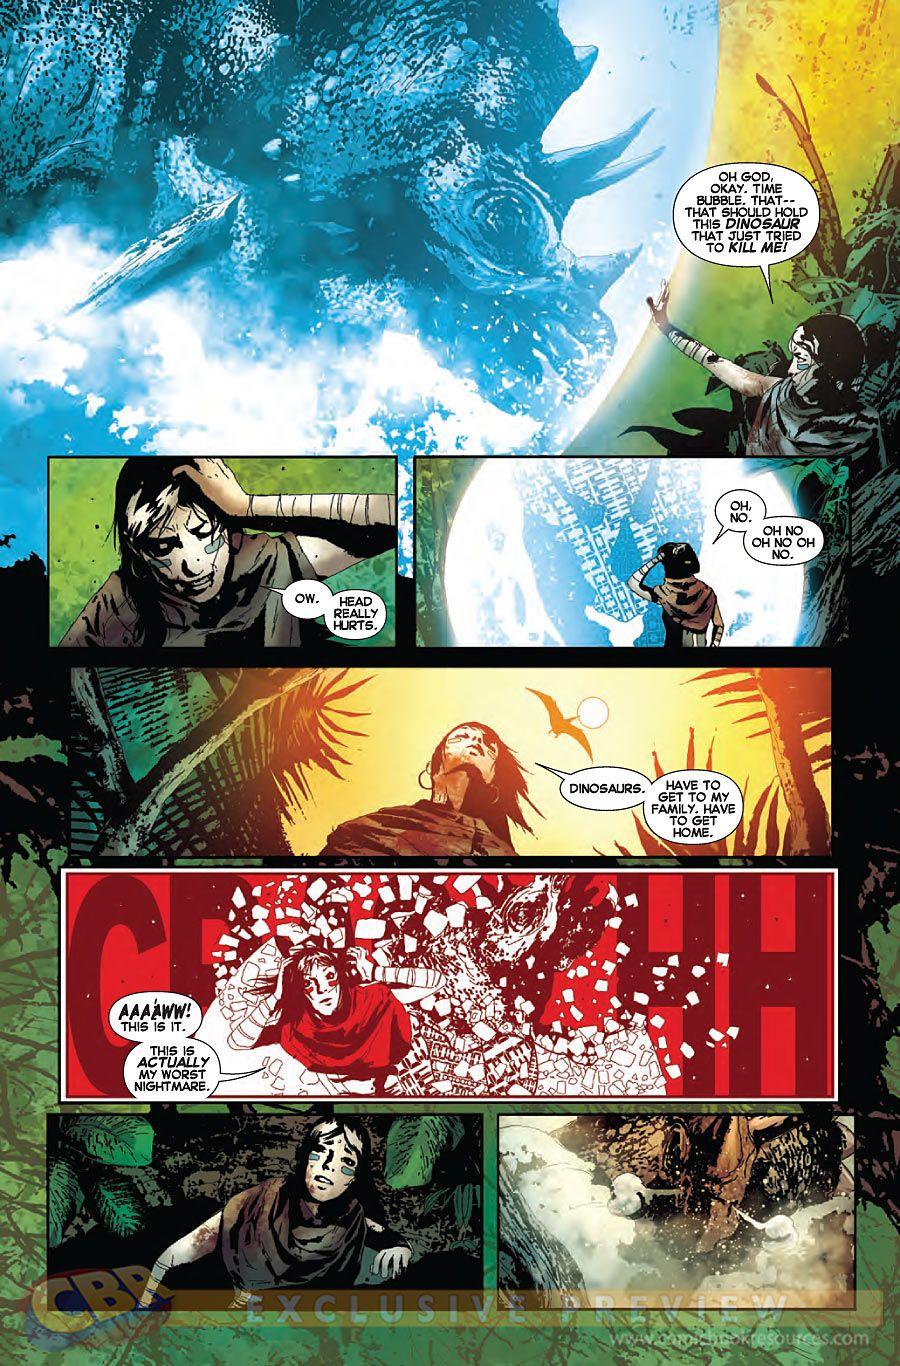 Preview All New X Men Annual 1 All Comic Com X Men Brian Michael Bendis Digital Comic